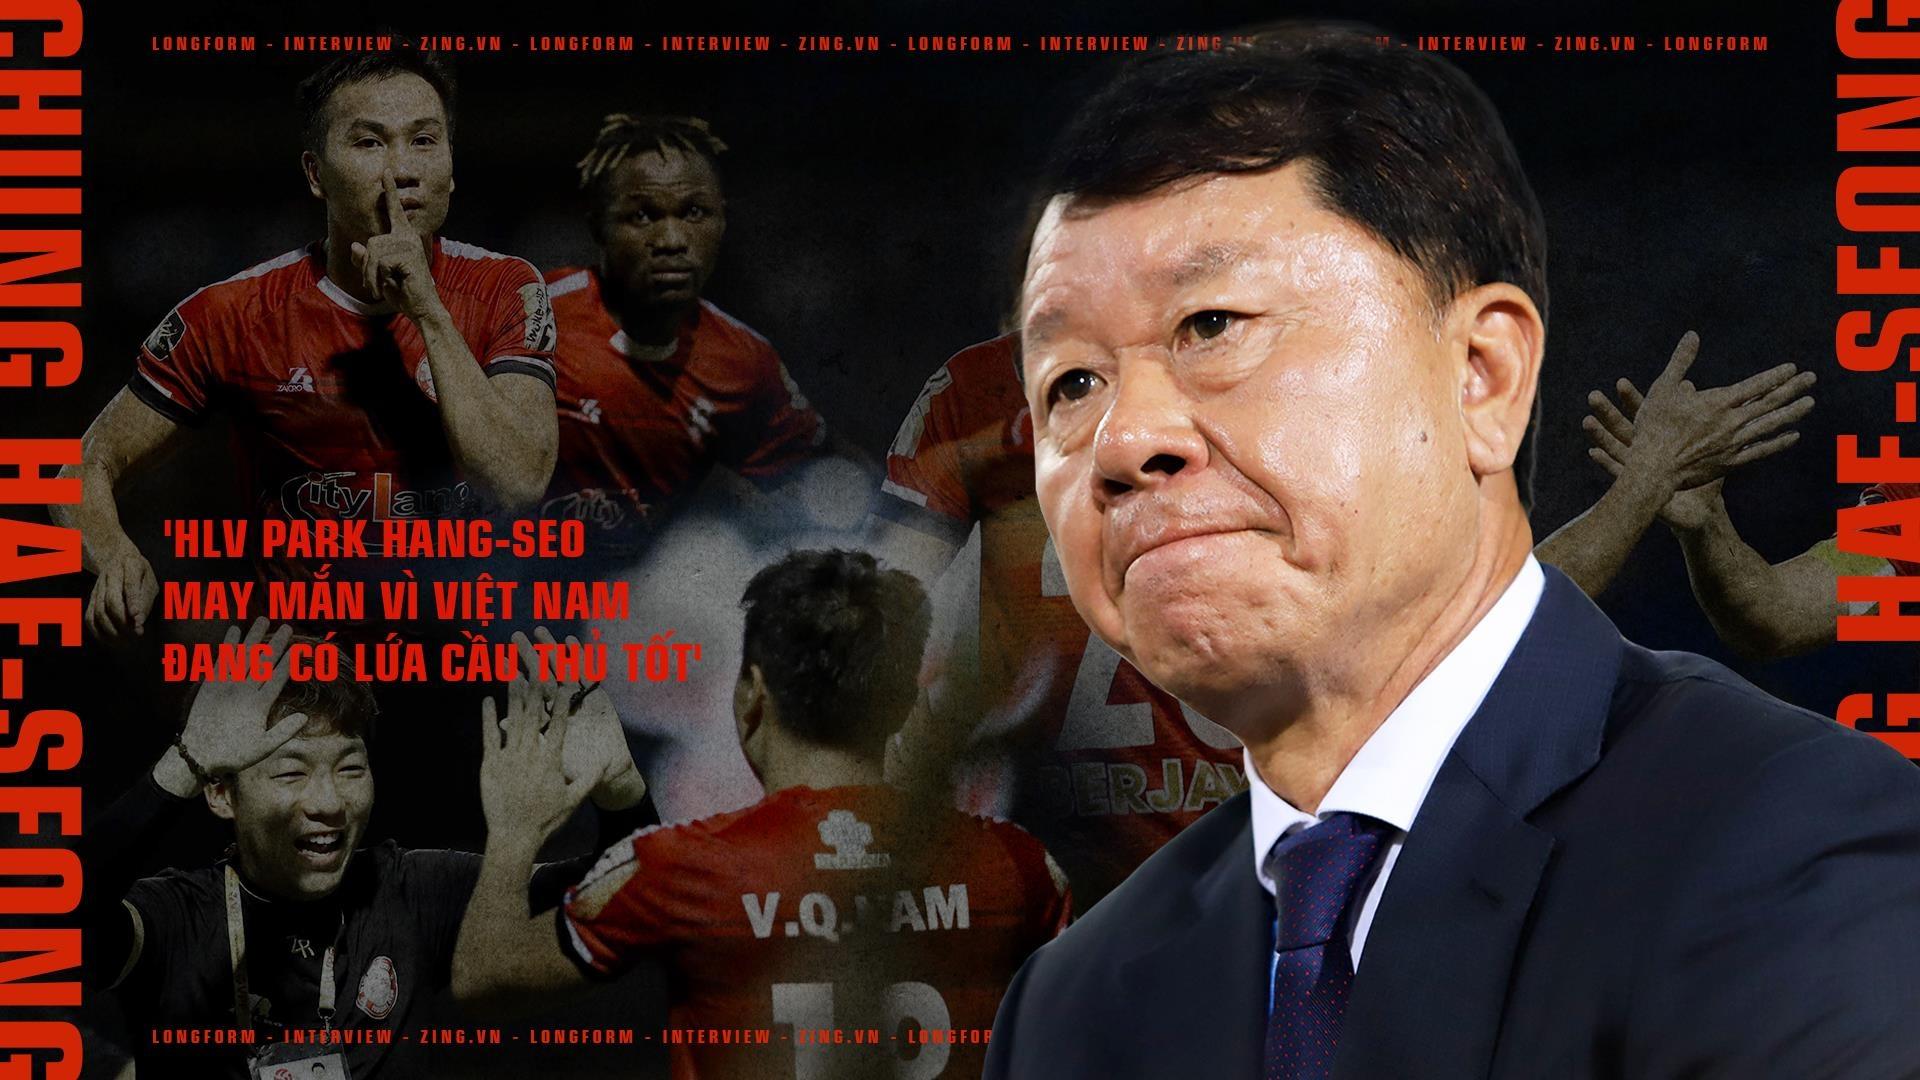 'HLV Park Hang-seo may man vi Viet Nam dang co lua cau thu tot' hinh anh 2